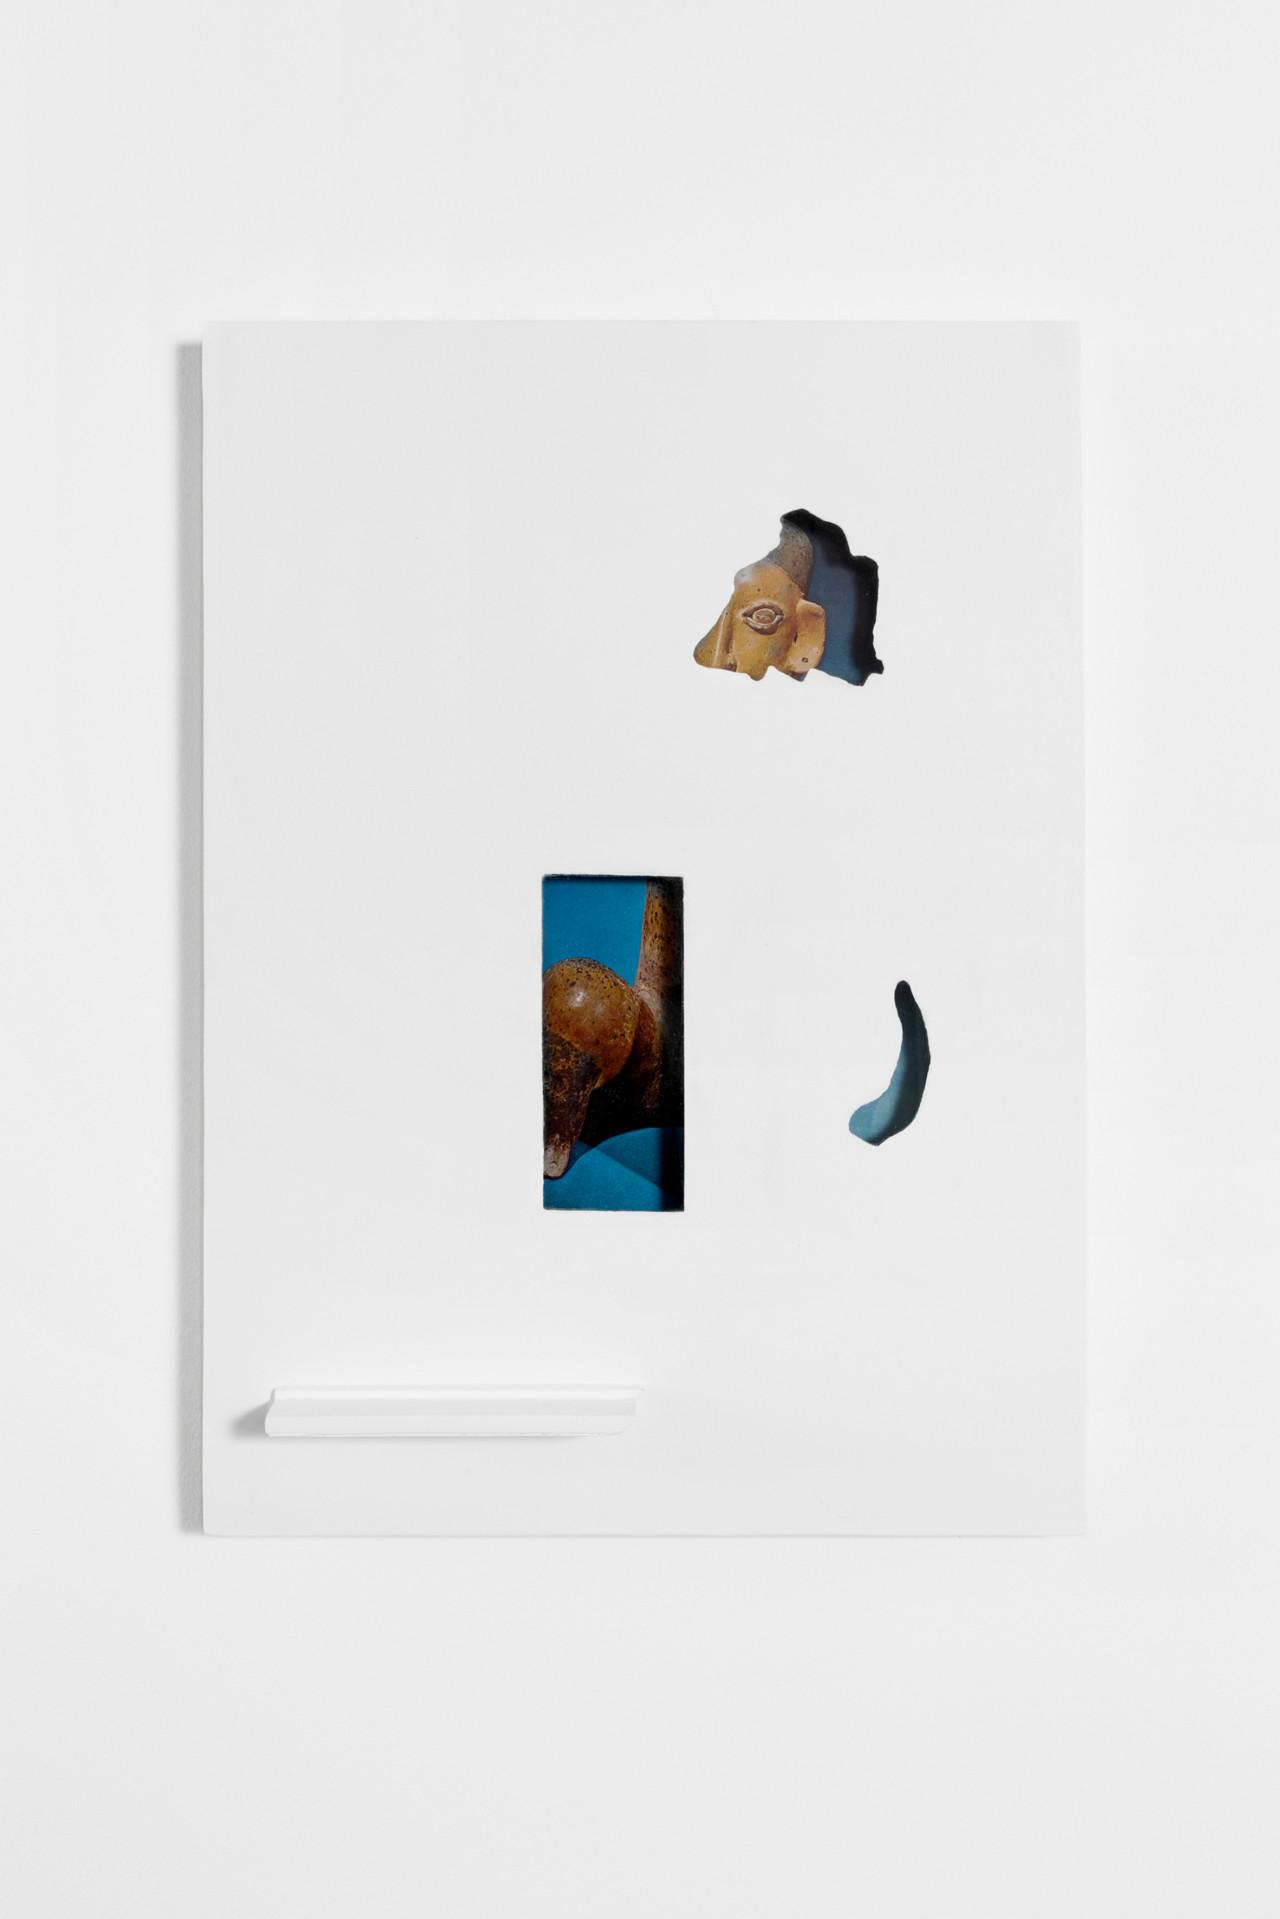 Untitled, 2018, found image, glass, wood, intonachino, wall paint; 31cm x 44cm x 4cm